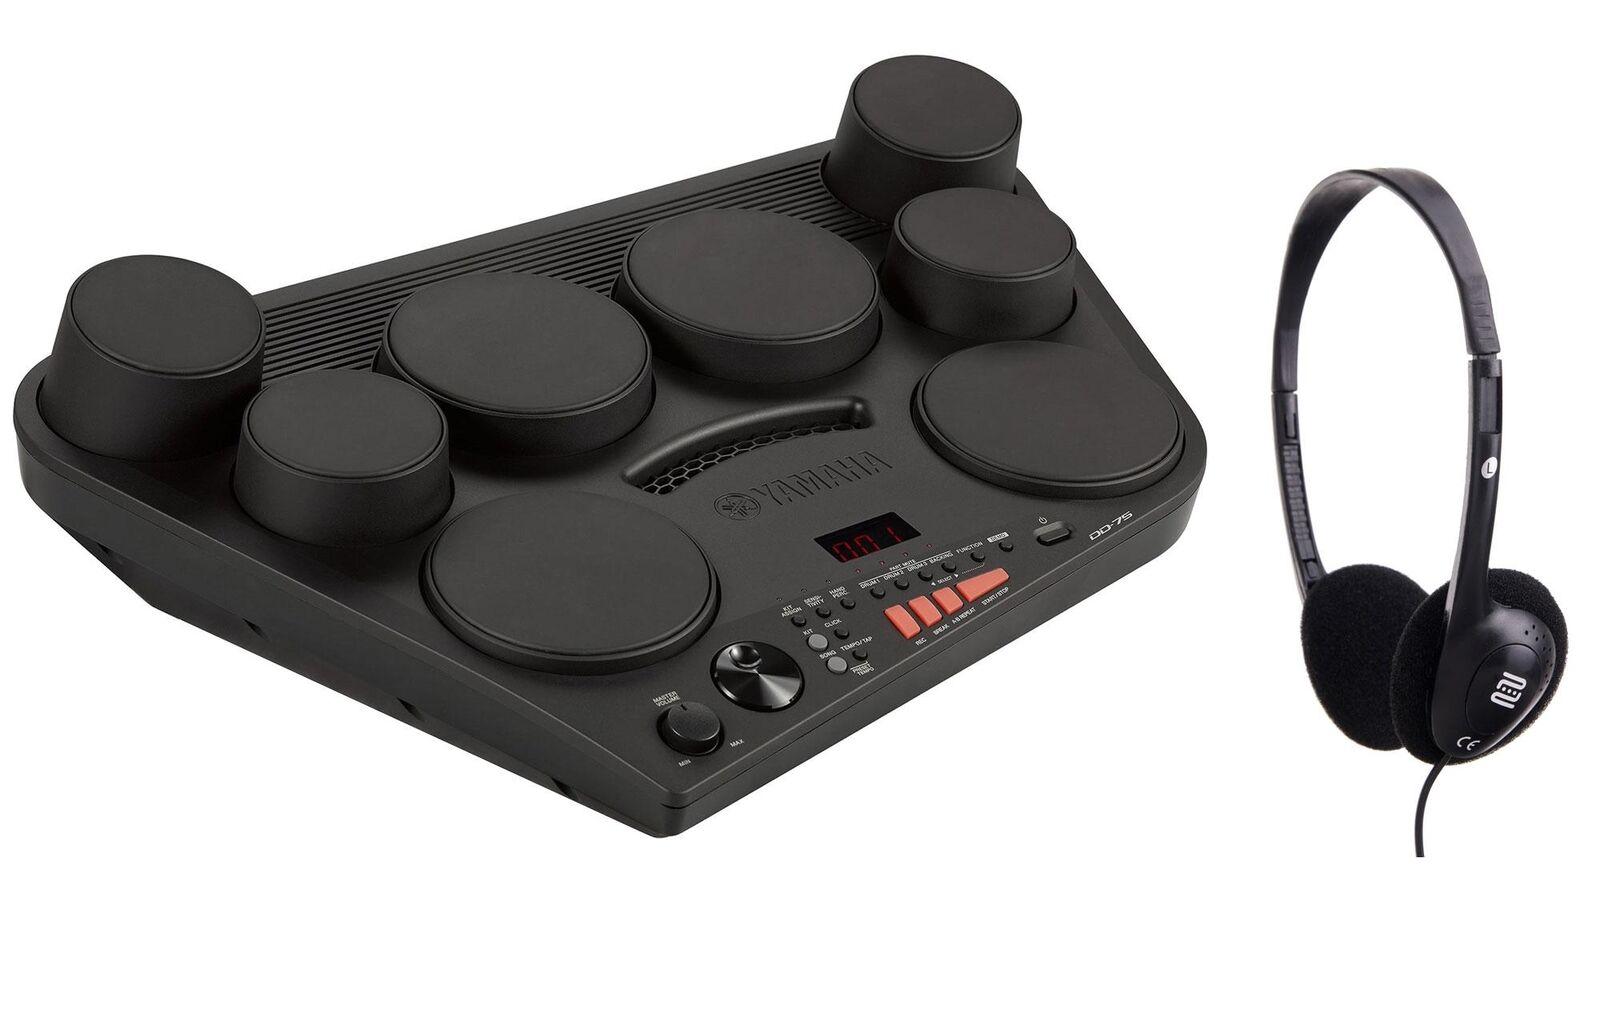 Yamaha DD-75 E-Drum Set Kopfhörer Netzteil Drumkit MIDI AUX Batterie kompakt